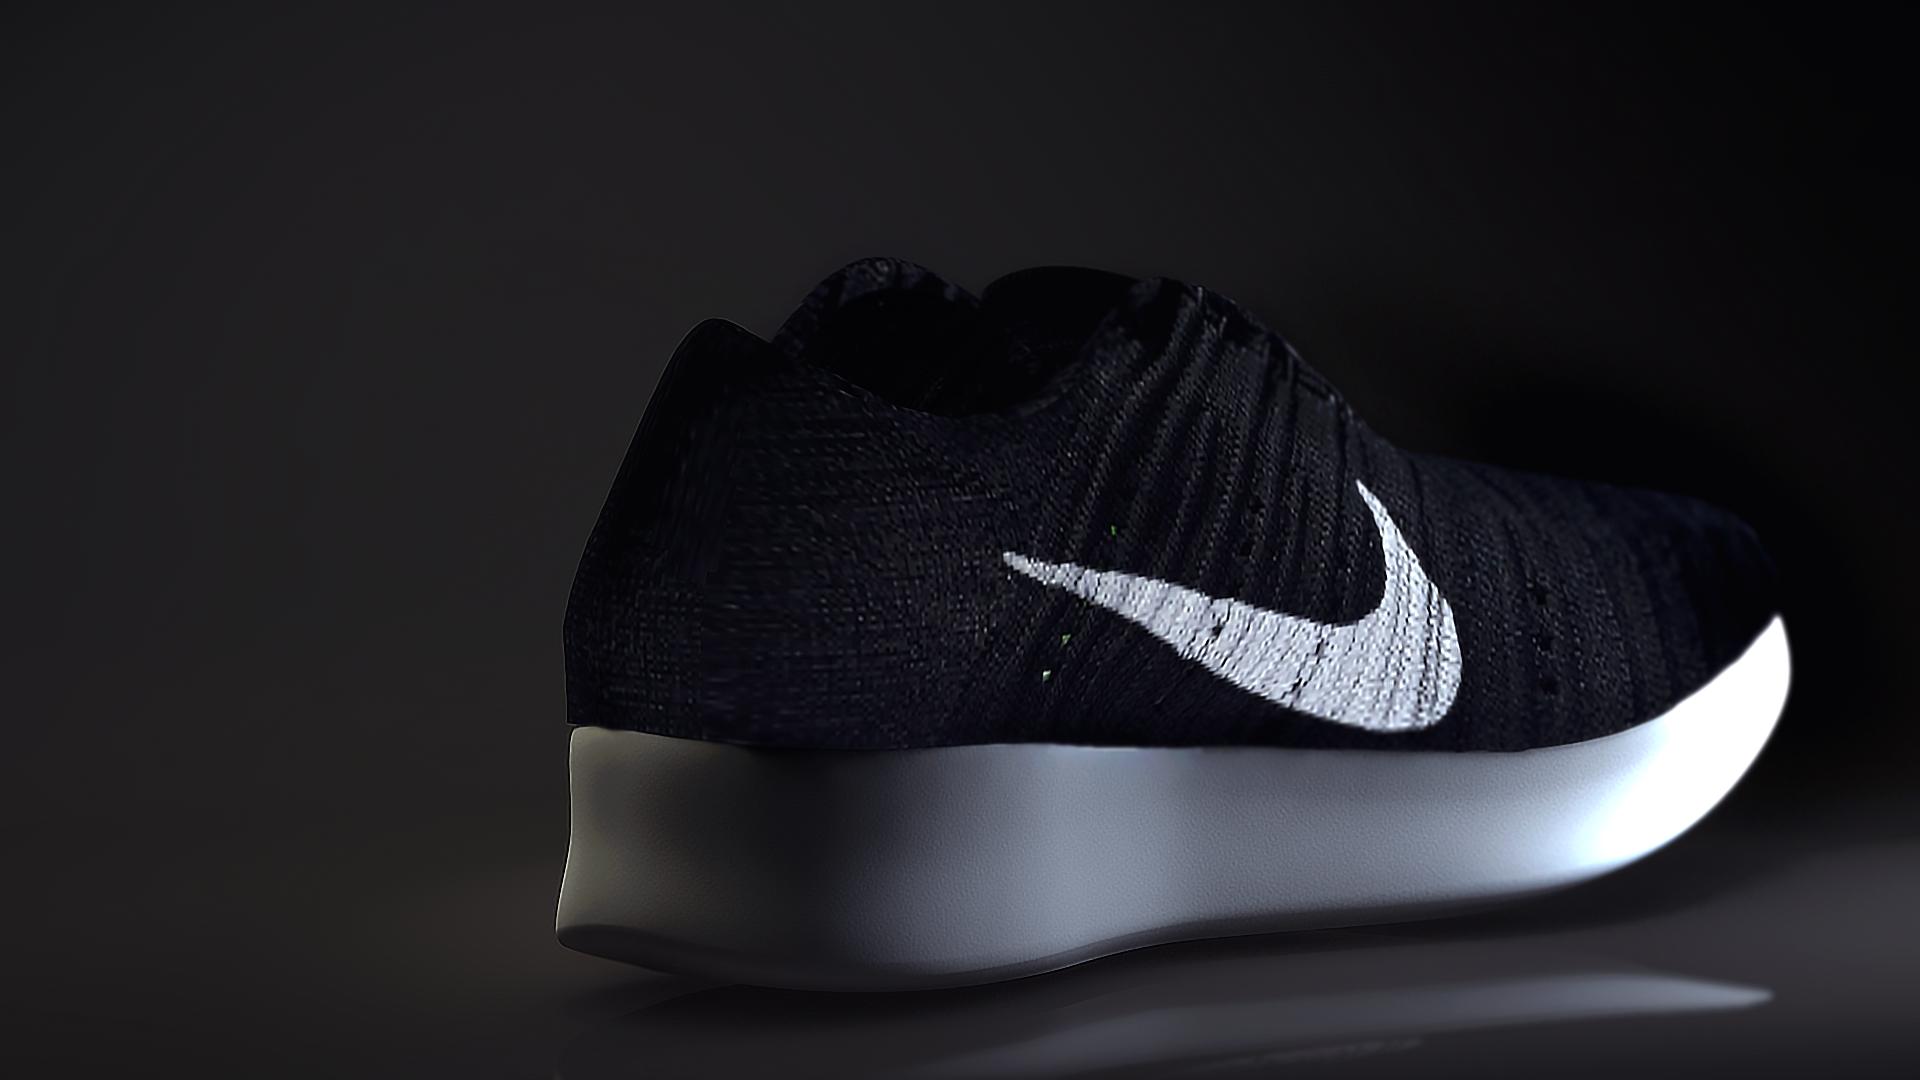 shoe2.png